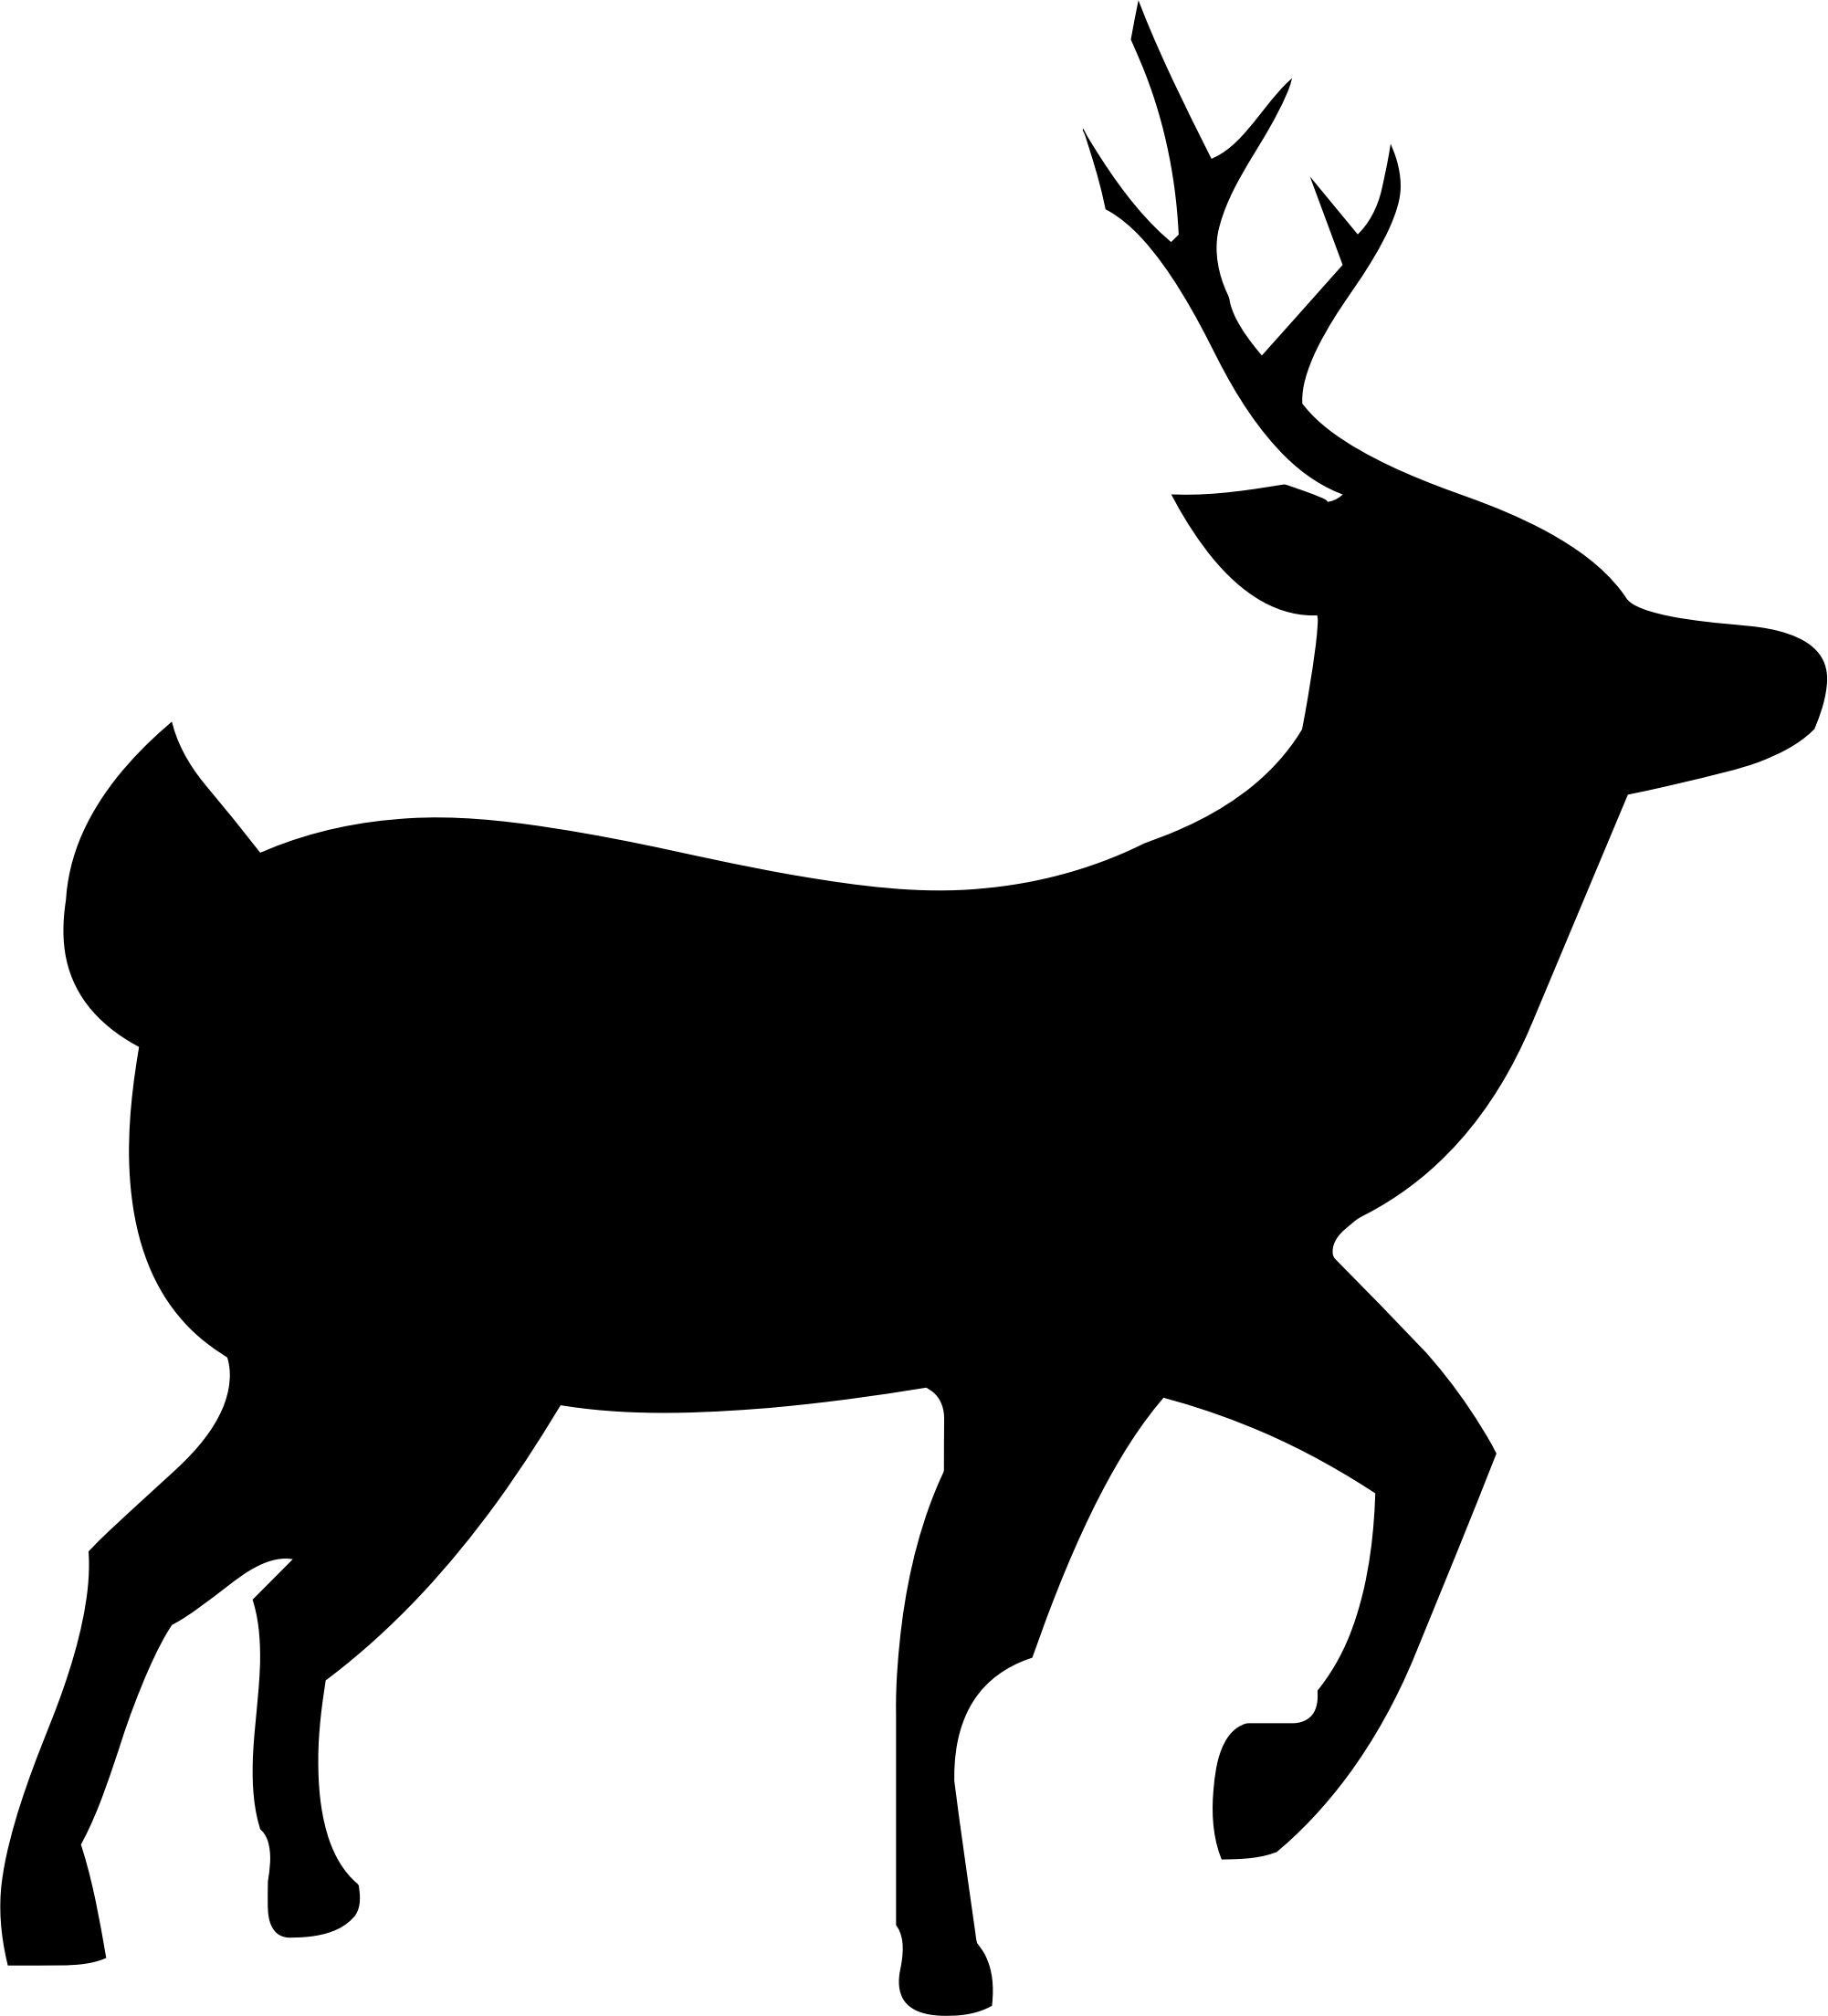 2002x2208 Deer Silhouette Clipart